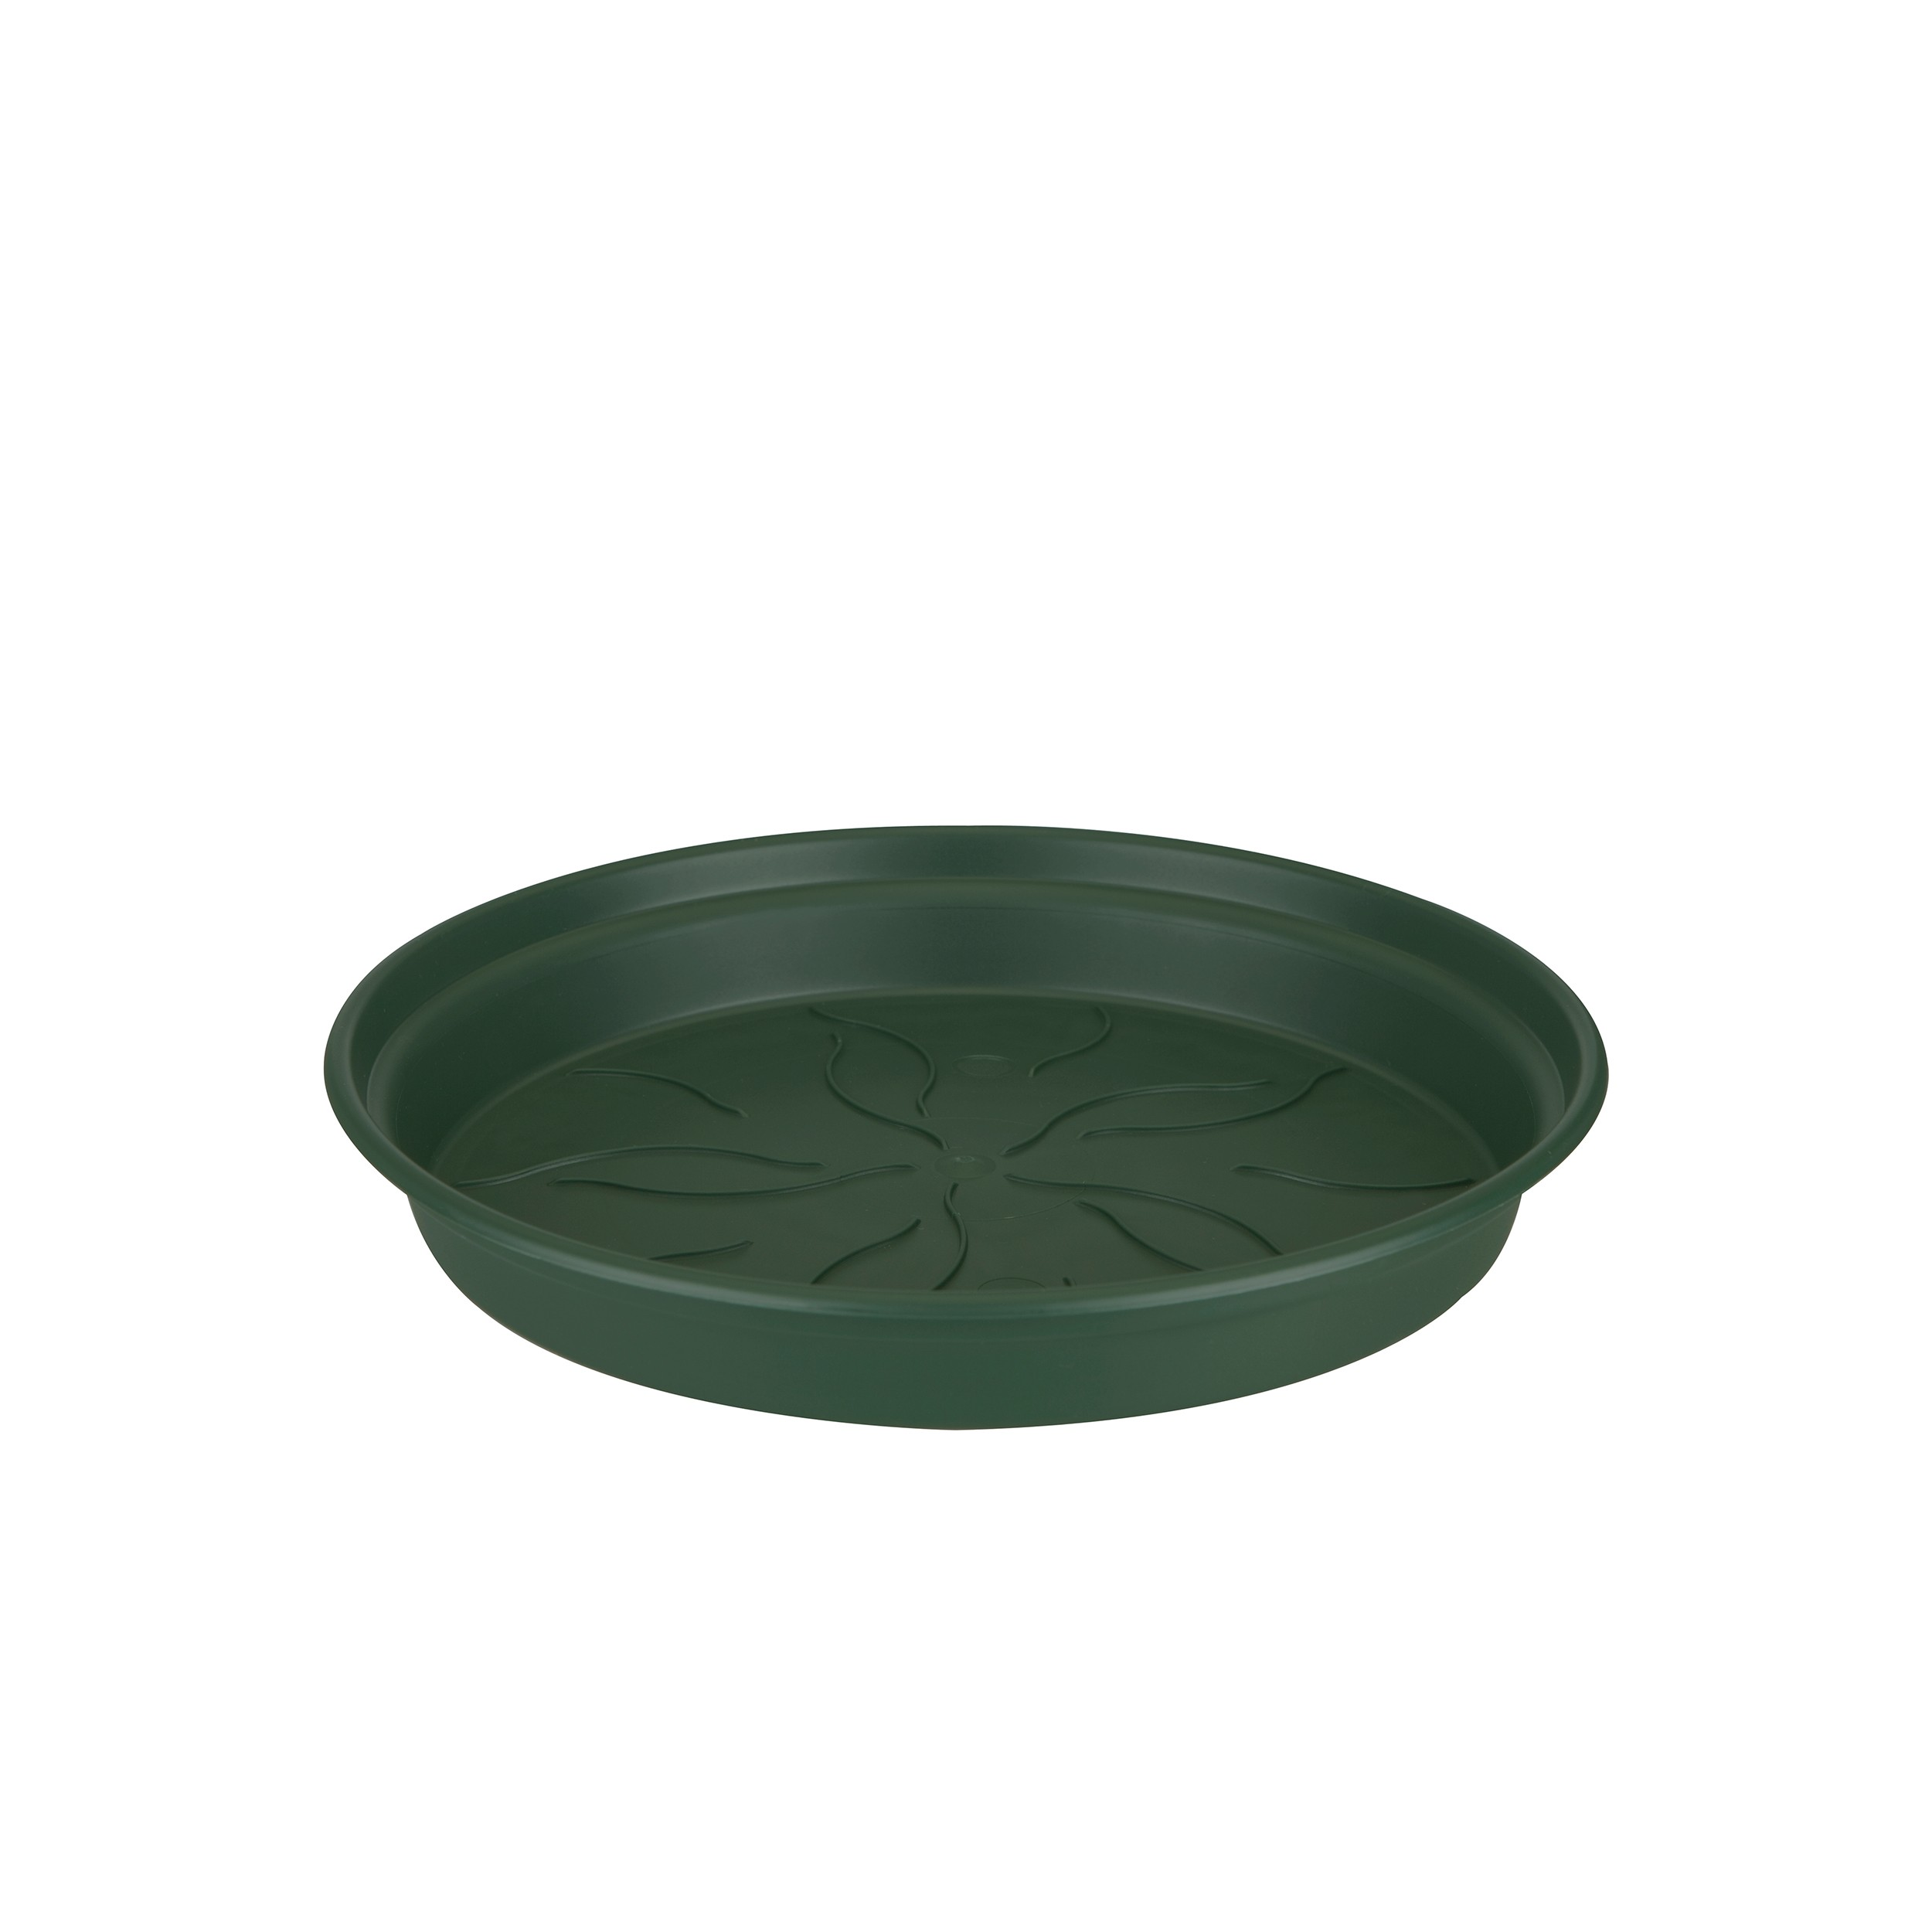 elho blumentopf untersetzer green basics 25cm rund kunststoff ebay. Black Bedroom Furniture Sets. Home Design Ideas